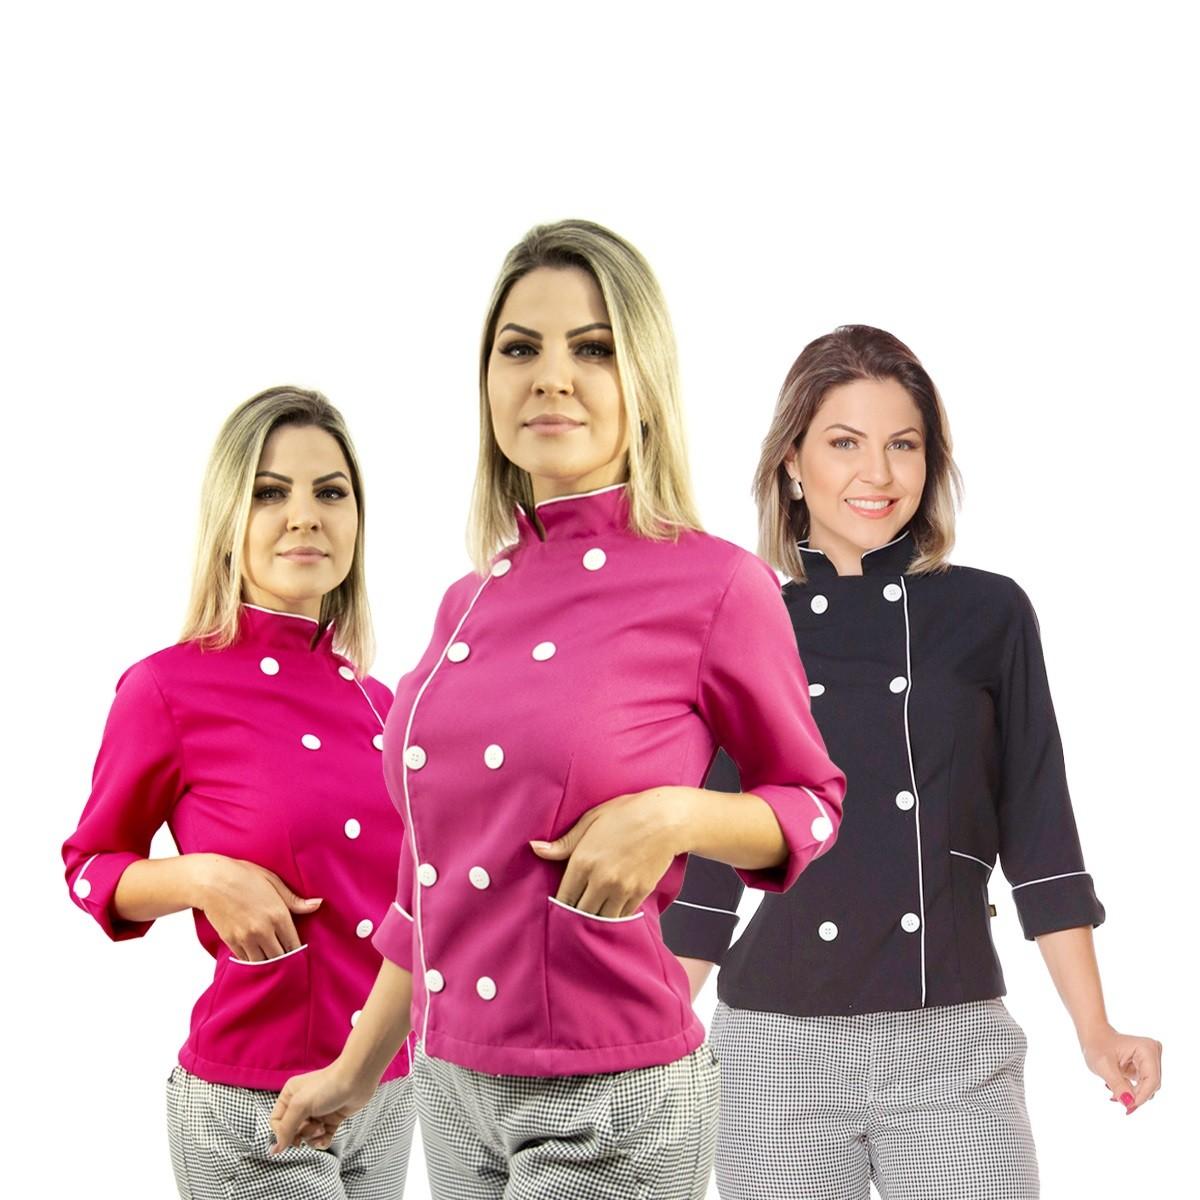 Kit Chef cozinha feminino Dolmã manga 3/4 + Calça feminina + Avental + Chapéu